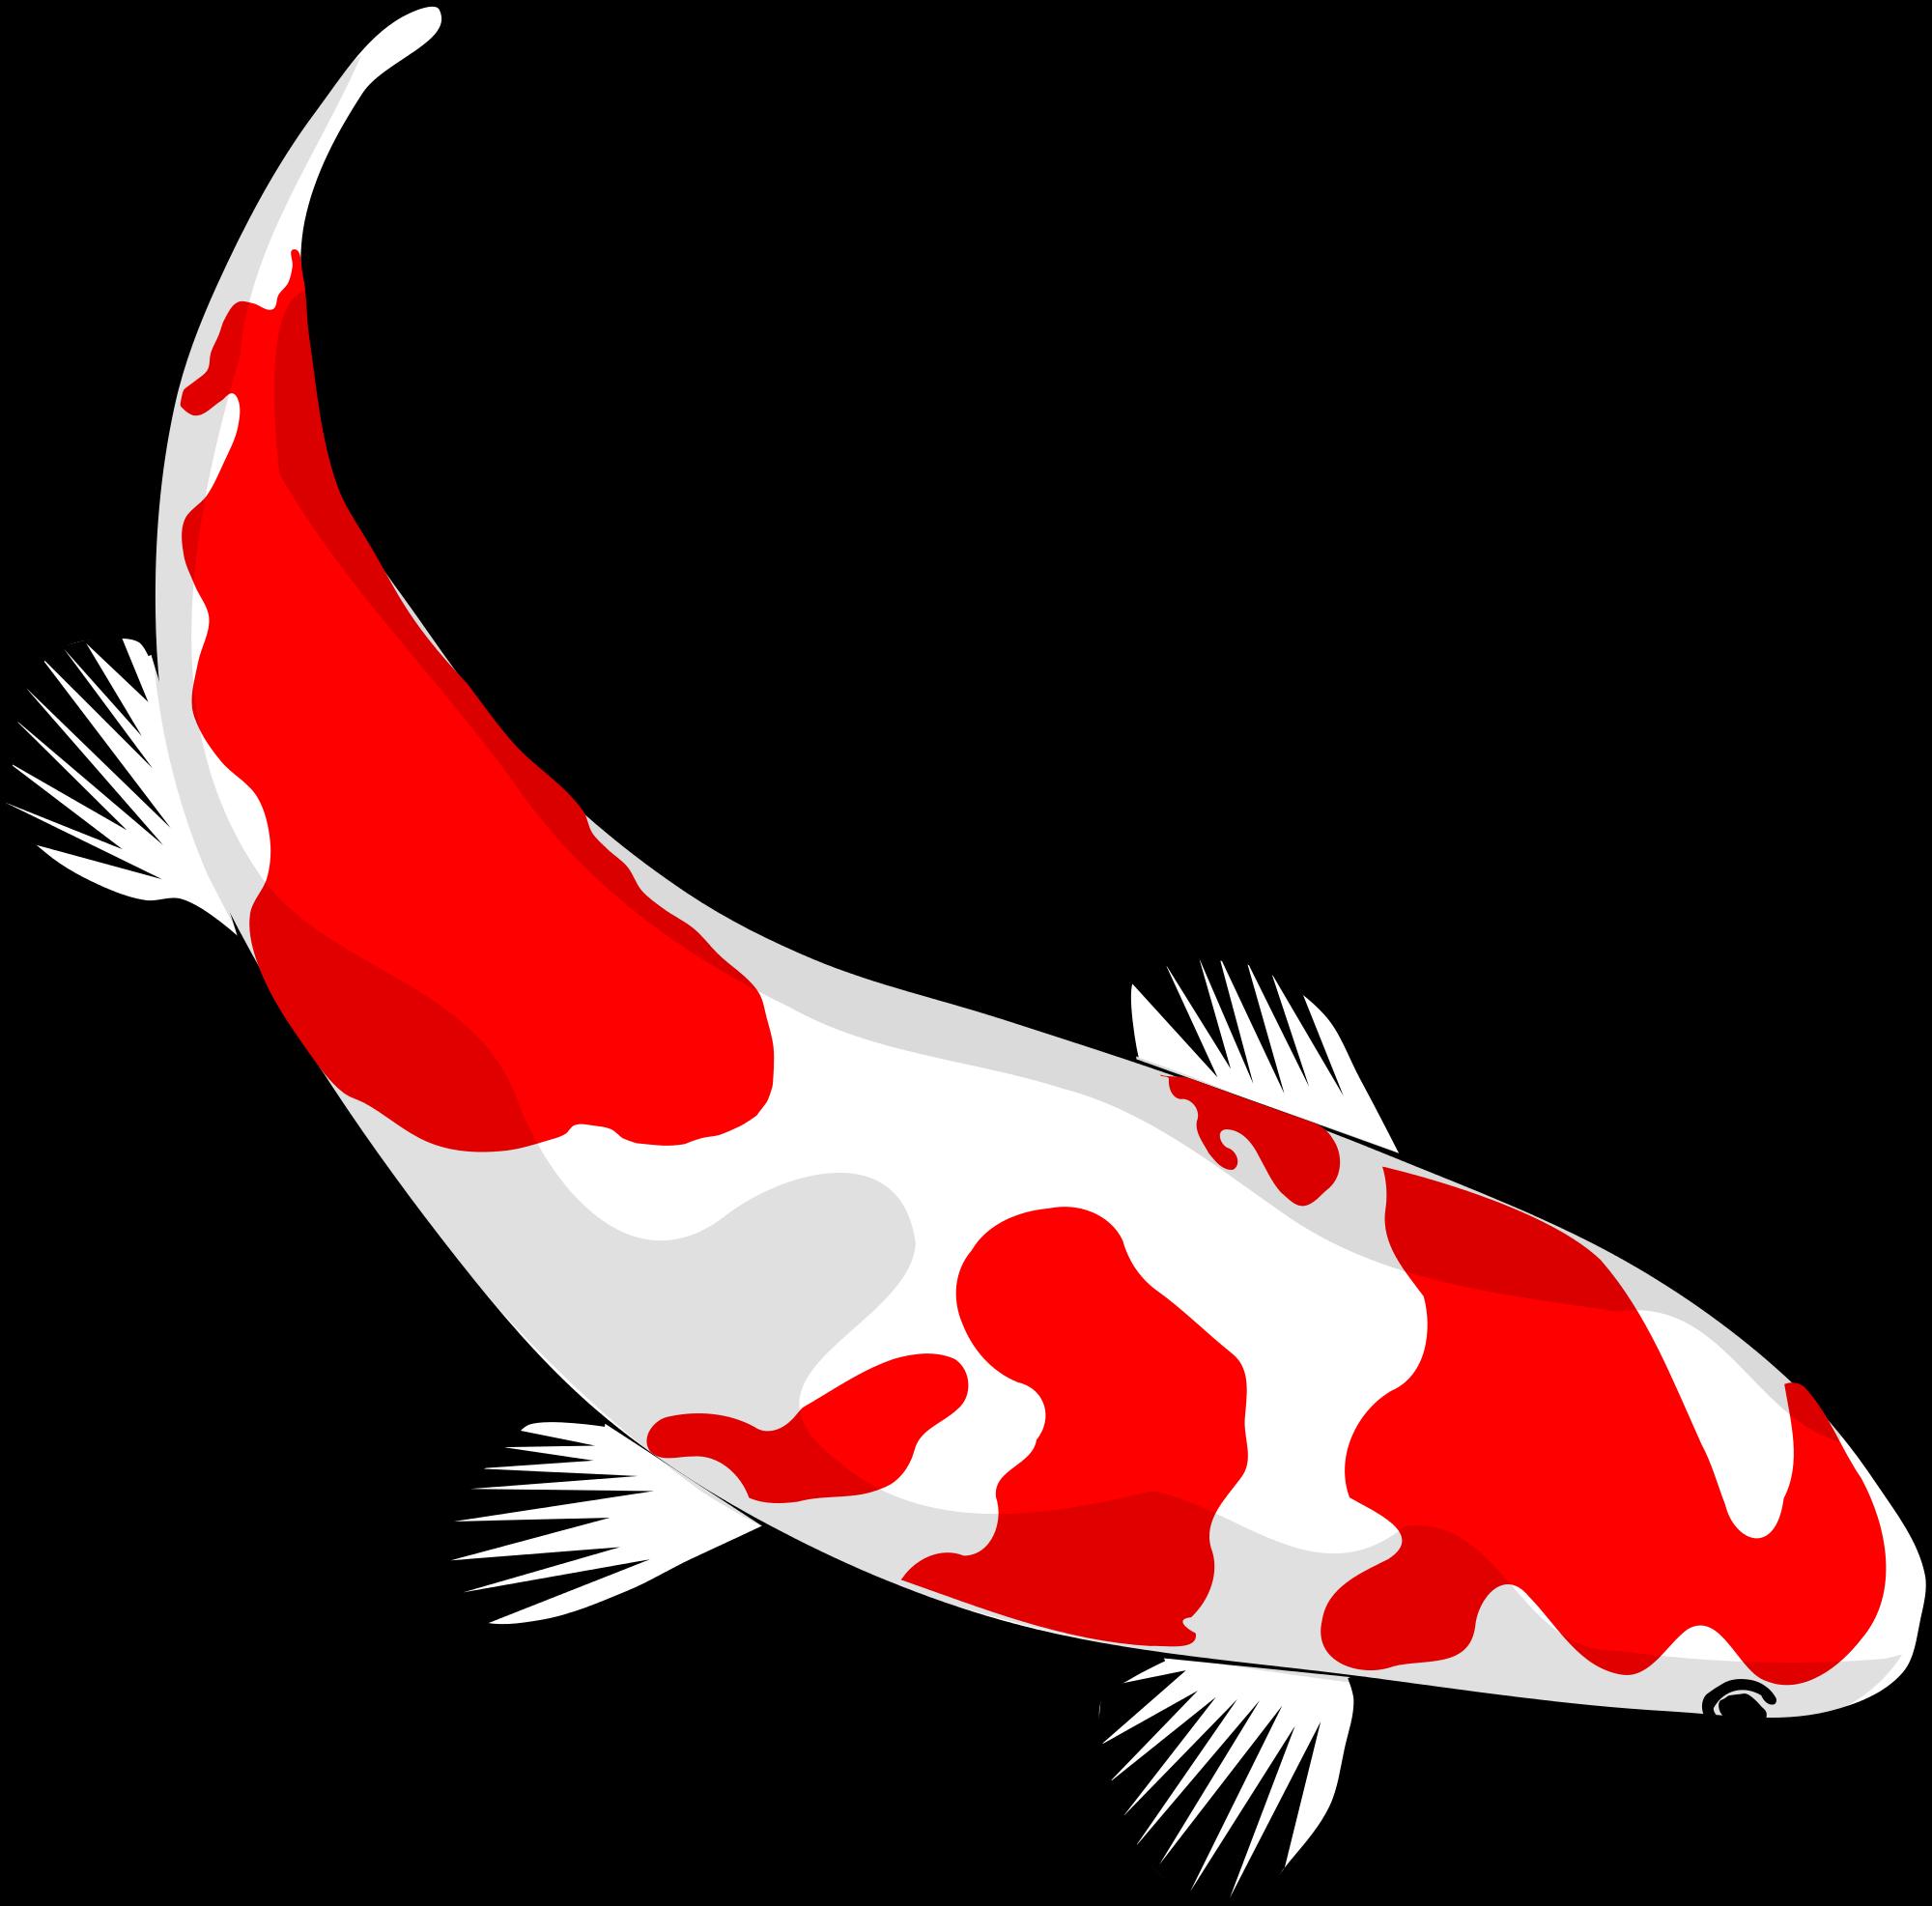 Fish clipart svg clip library stock File:Fish-159327.svg - Wikimedia Commons clip library stock